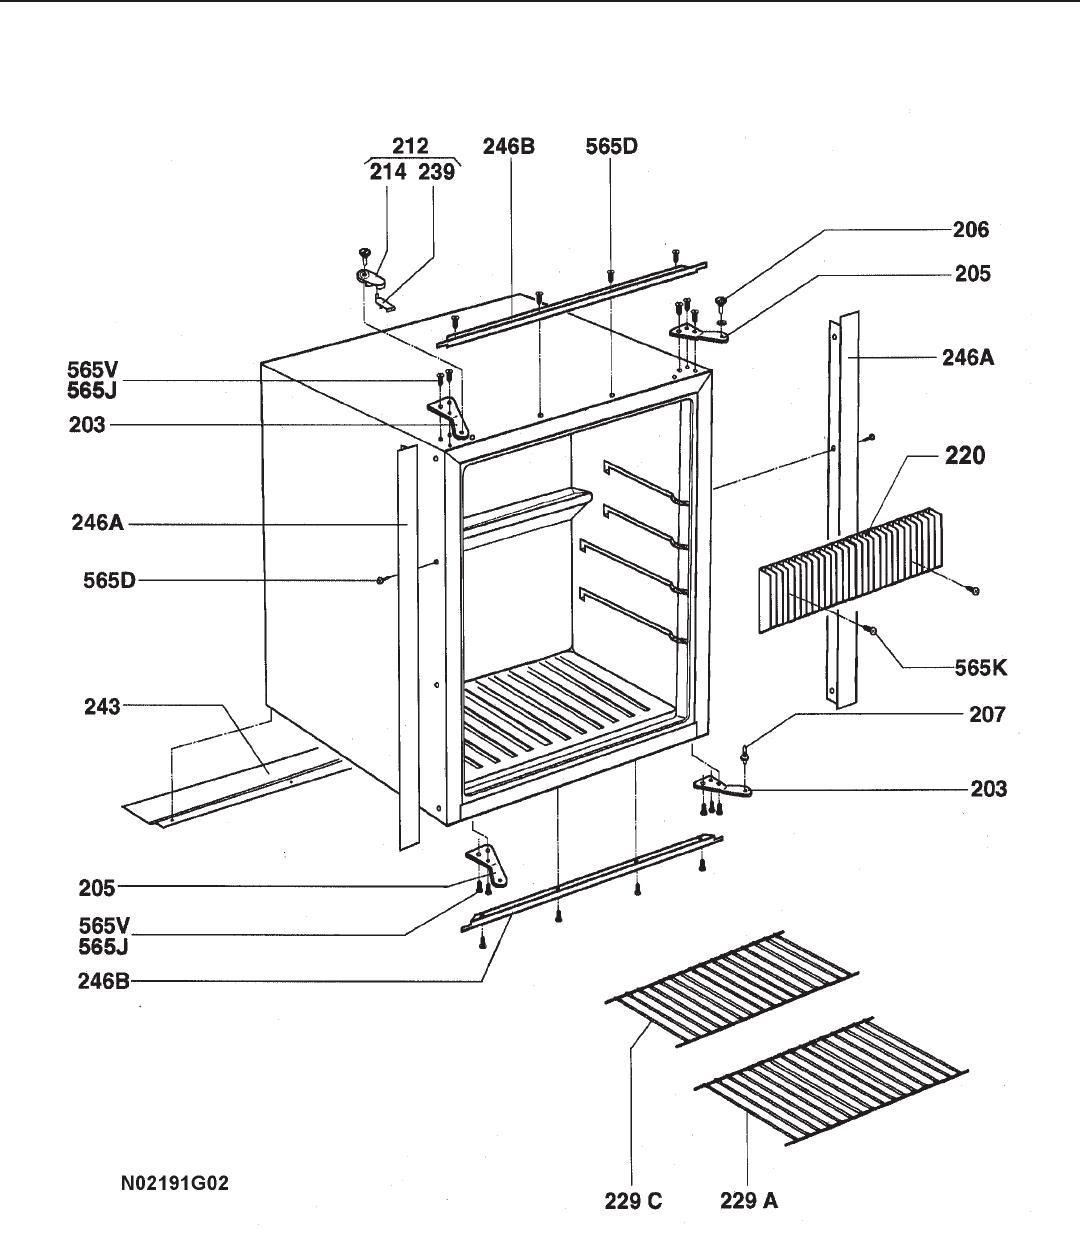 9 16 04 Rm Refrigerator Parts List